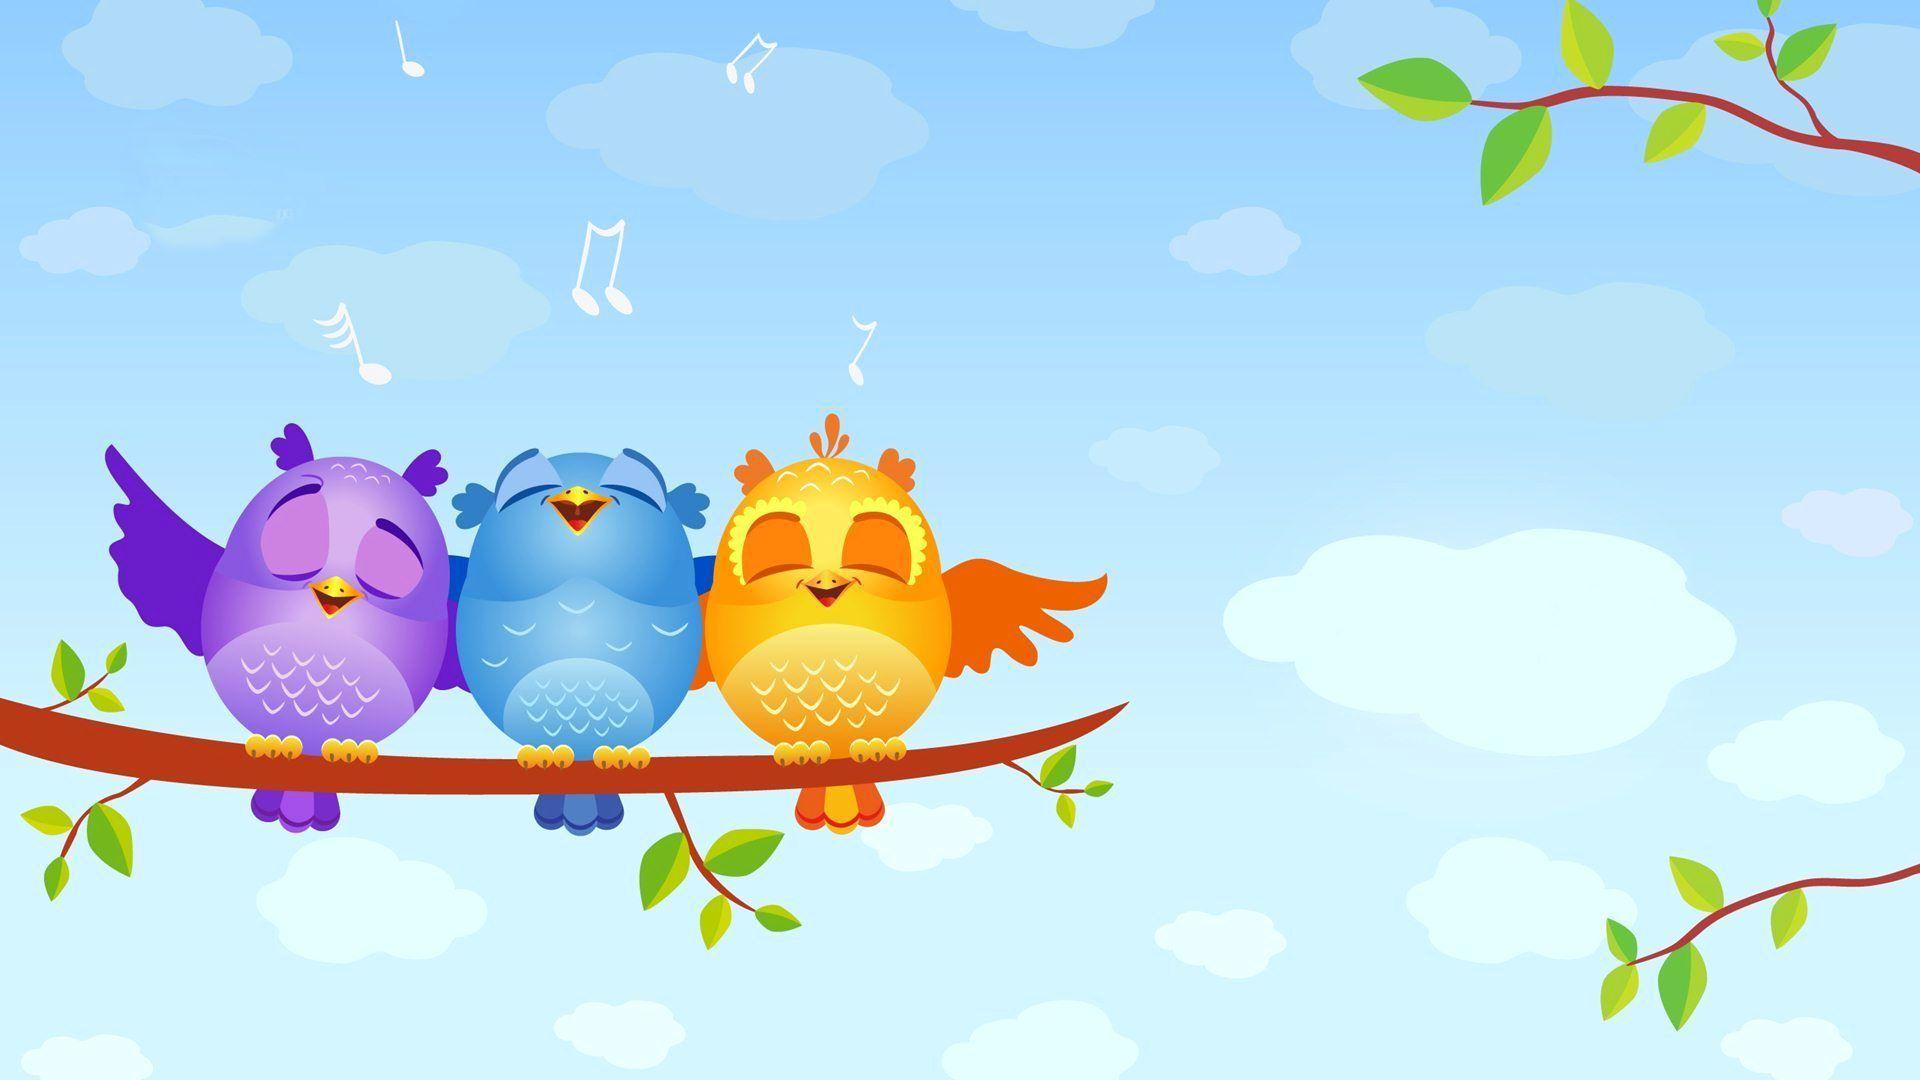 Download Cute Tweety Wallpapers Cartoon Bird Hd Wallpaper Wallpaper Series Love Quote